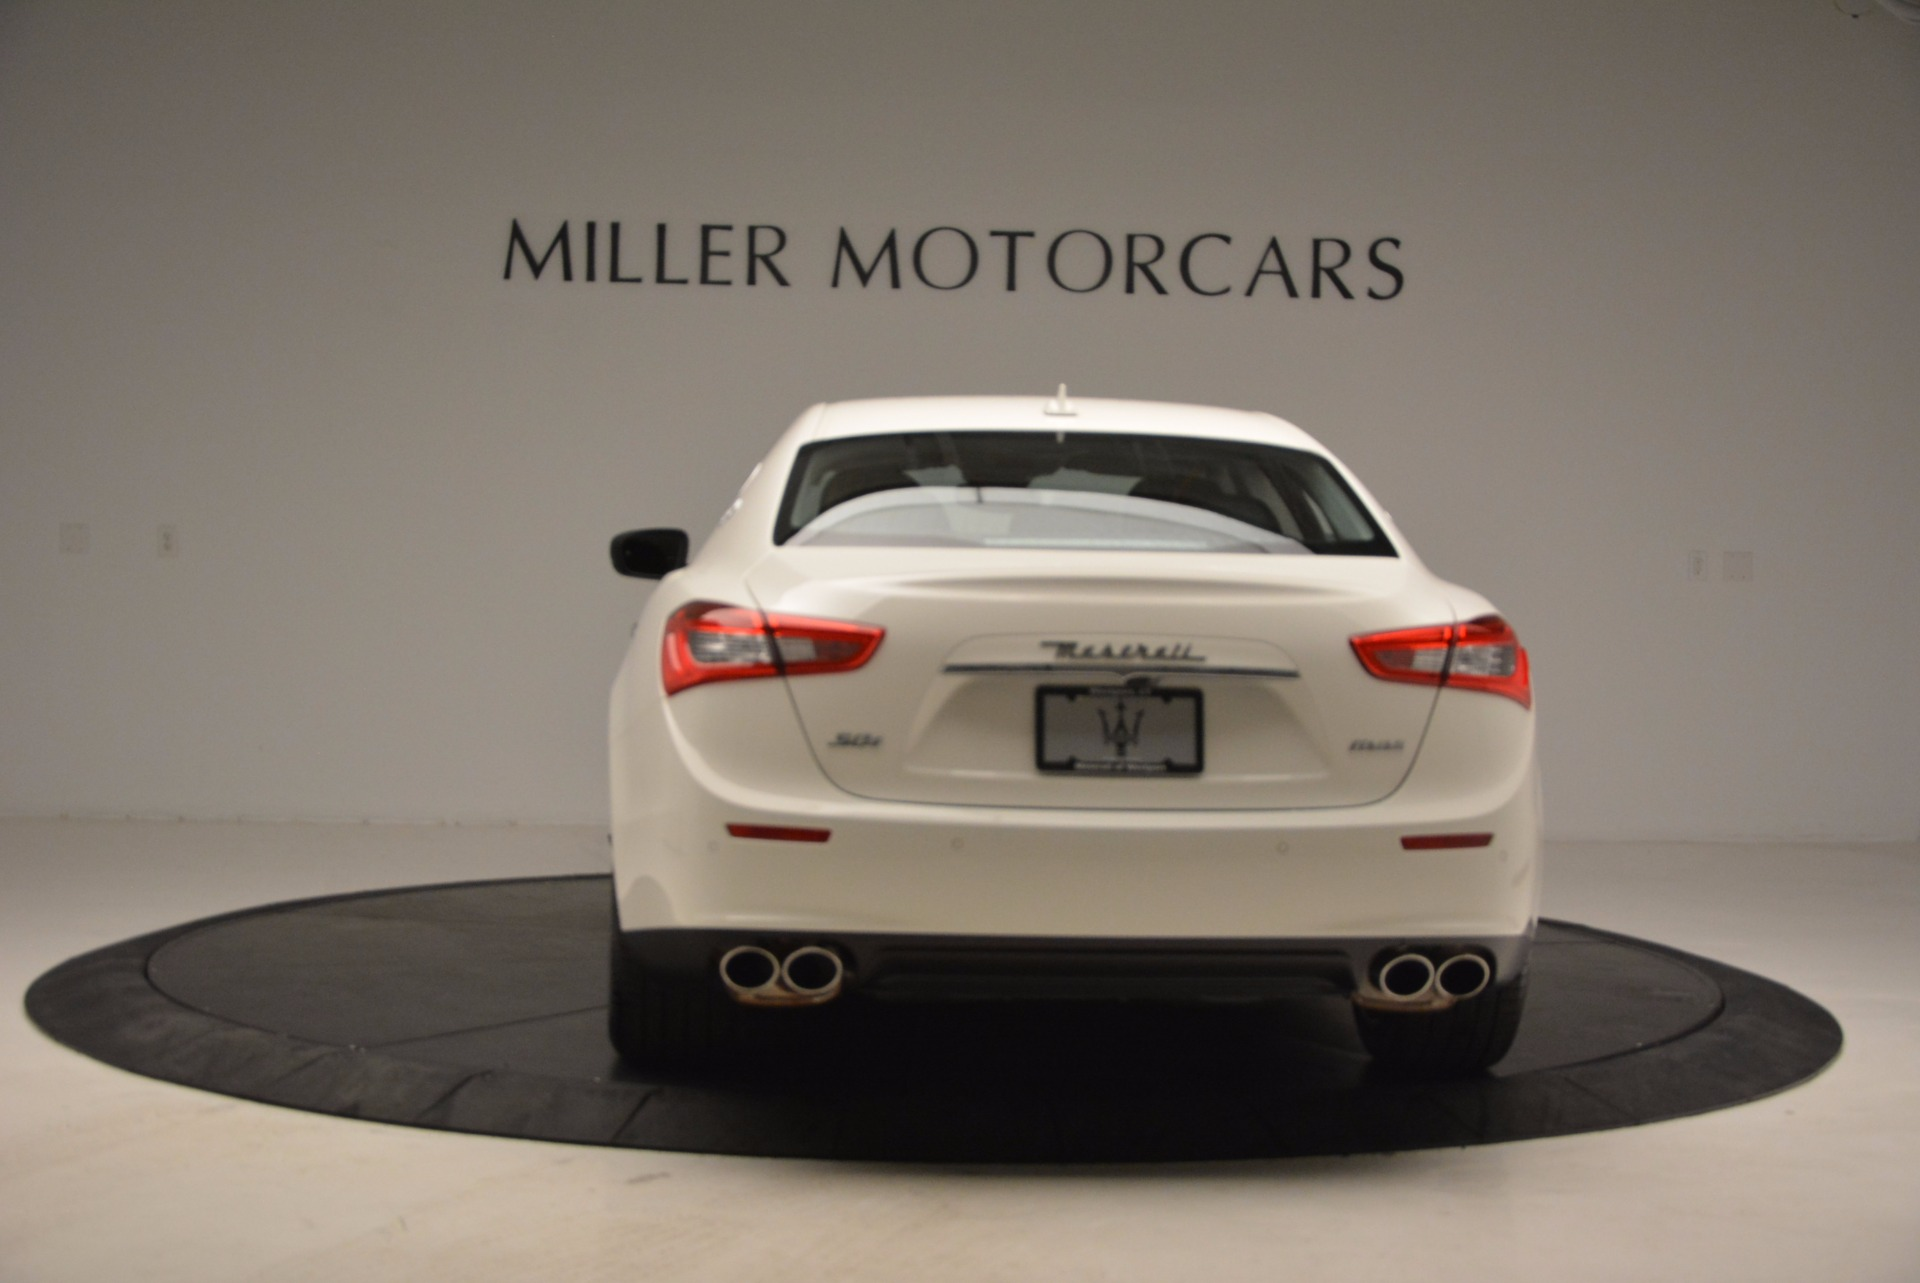 New 2017 Maserati Ghibli S Q4 EX-Loaner For Sale In Westport, CT 1031_p6